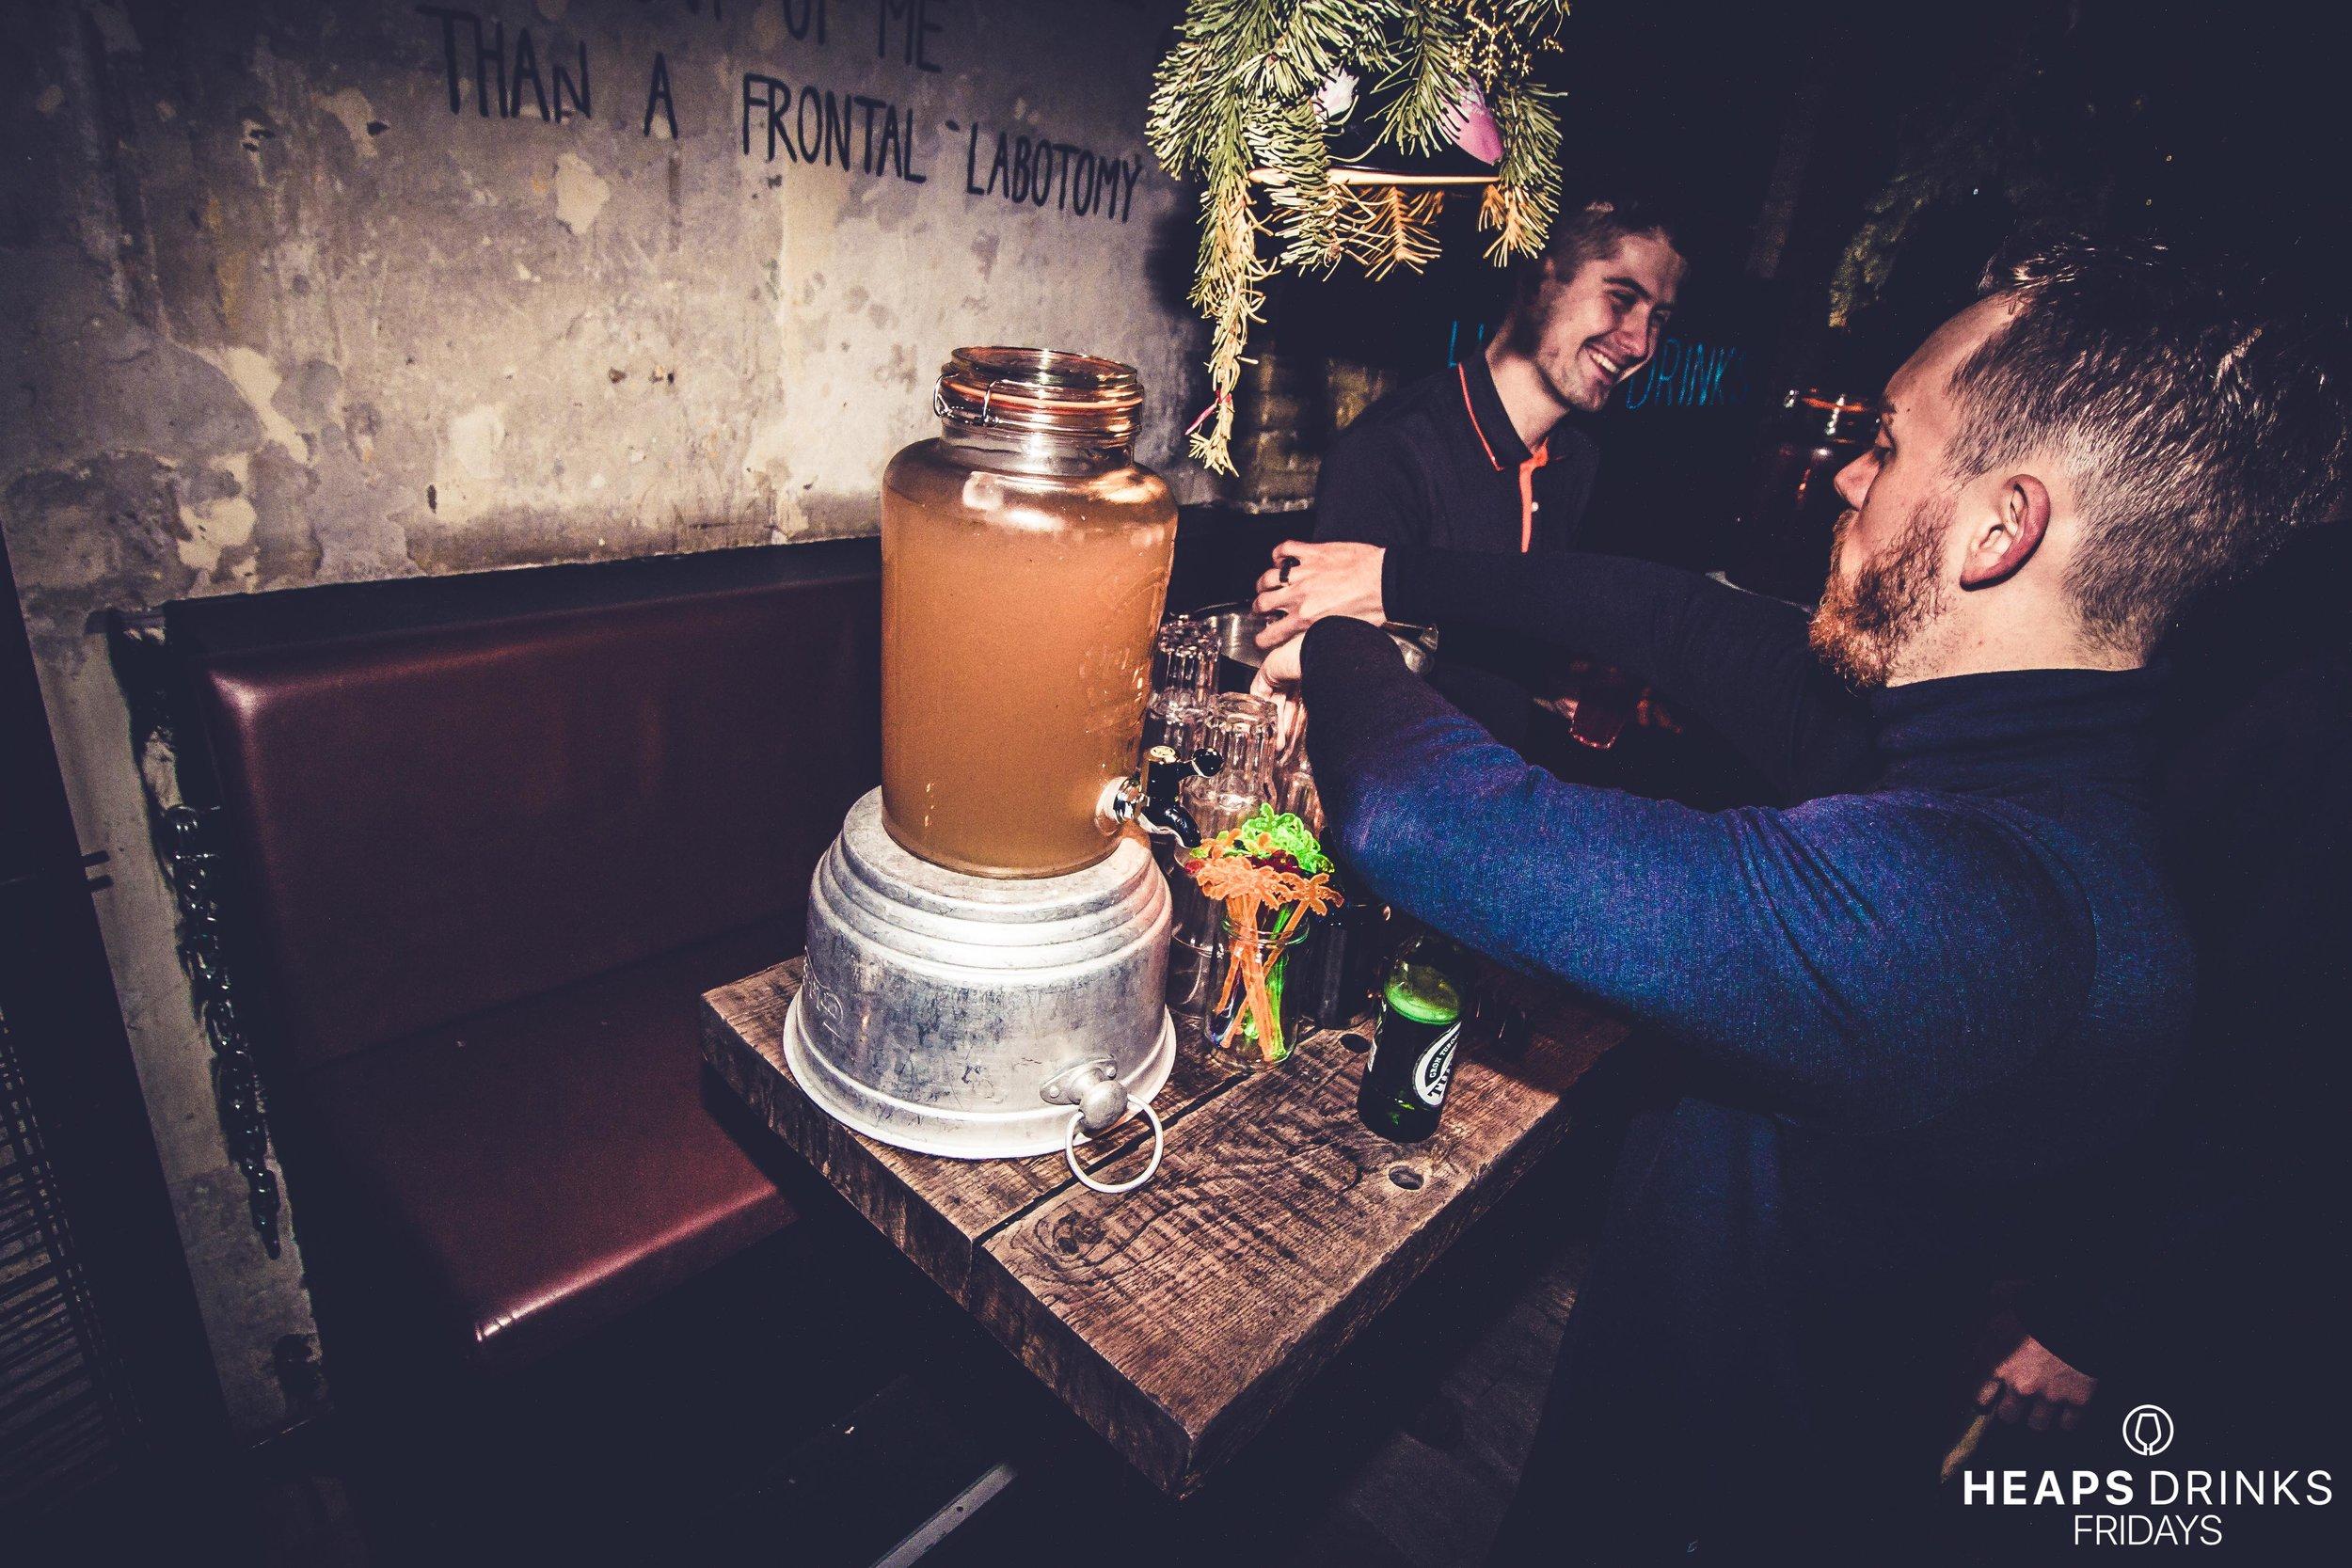 Heaps_drinks_1.jpg